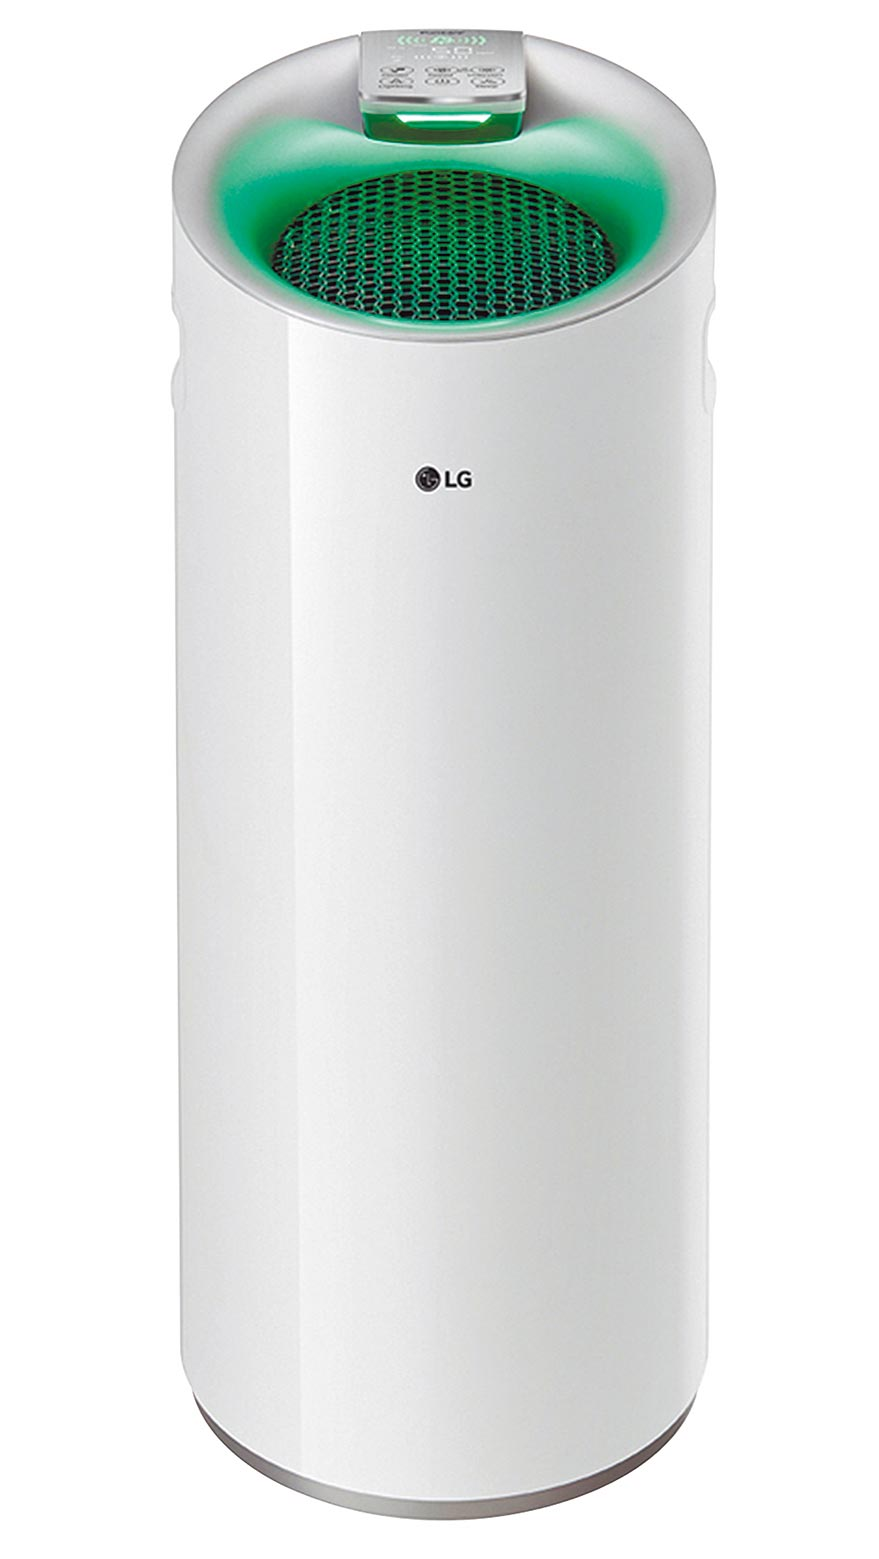 PChome 24h購物的LG AS401WWJ1 WIFI空氣清淨機,網路價1萬5900元。(PChome 24h購物提供)